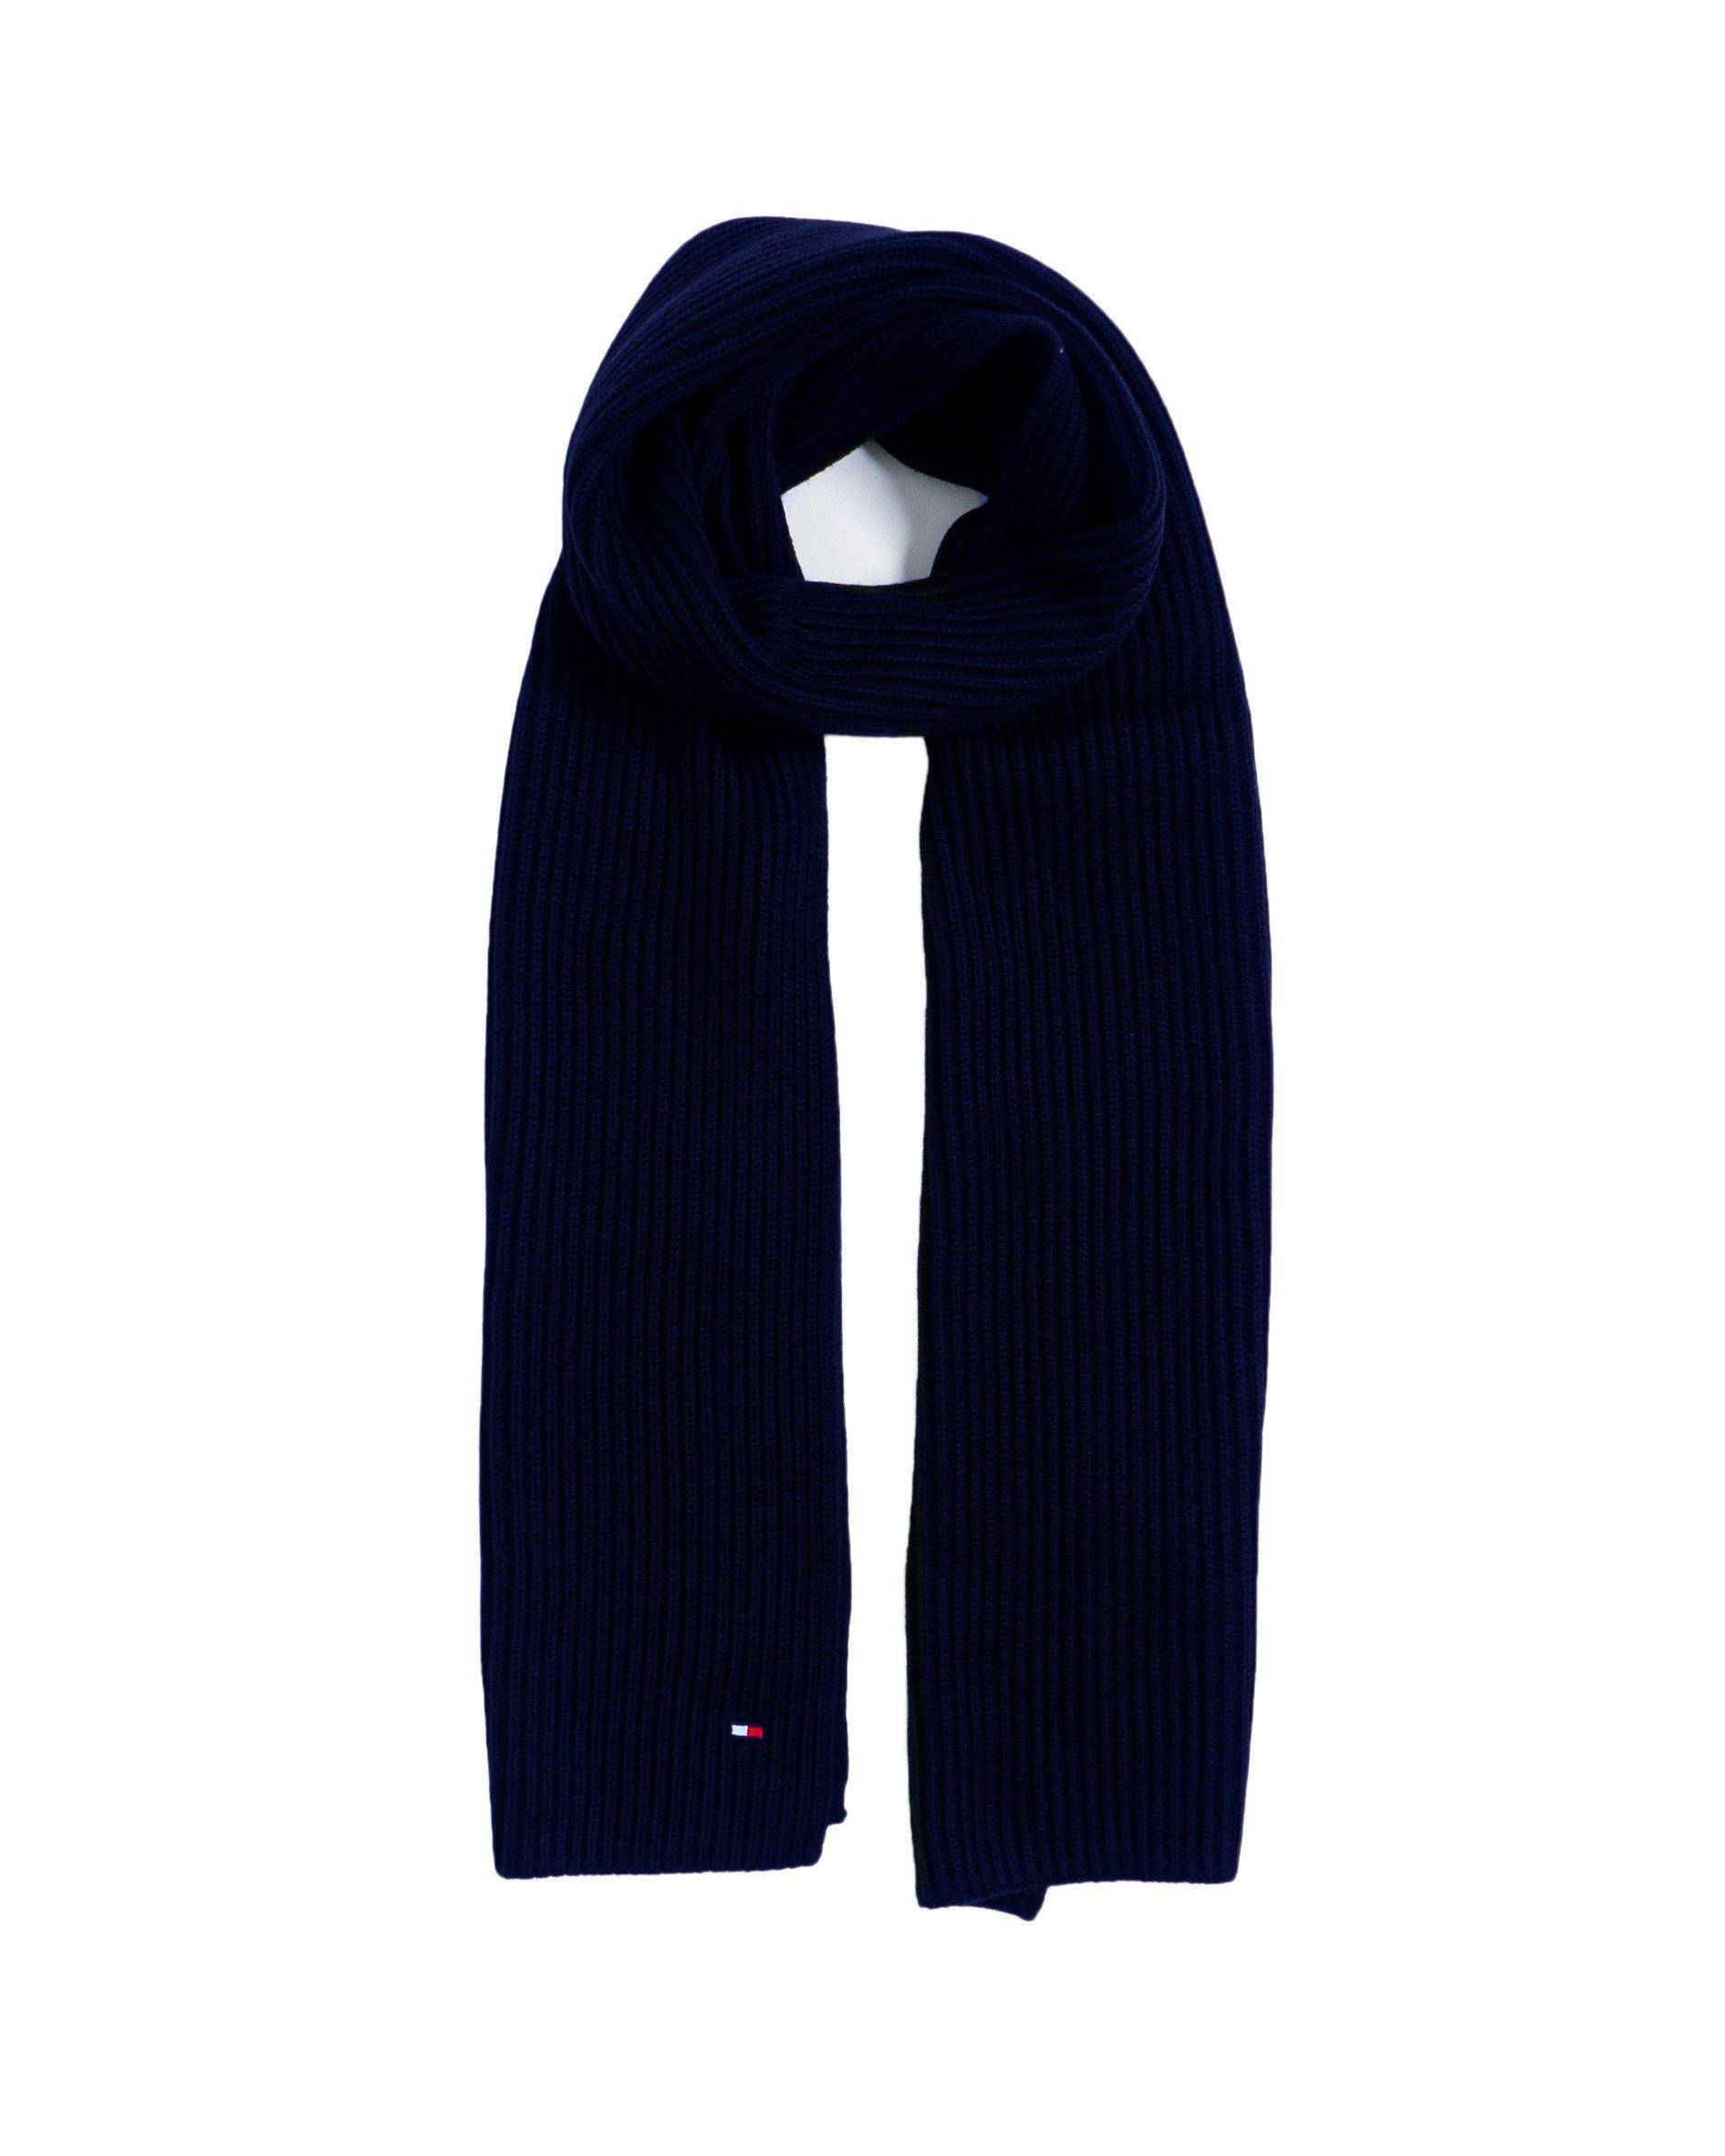 Tommy Hilfiger Women's Scarf Various Colours 179905 - blue UNICA